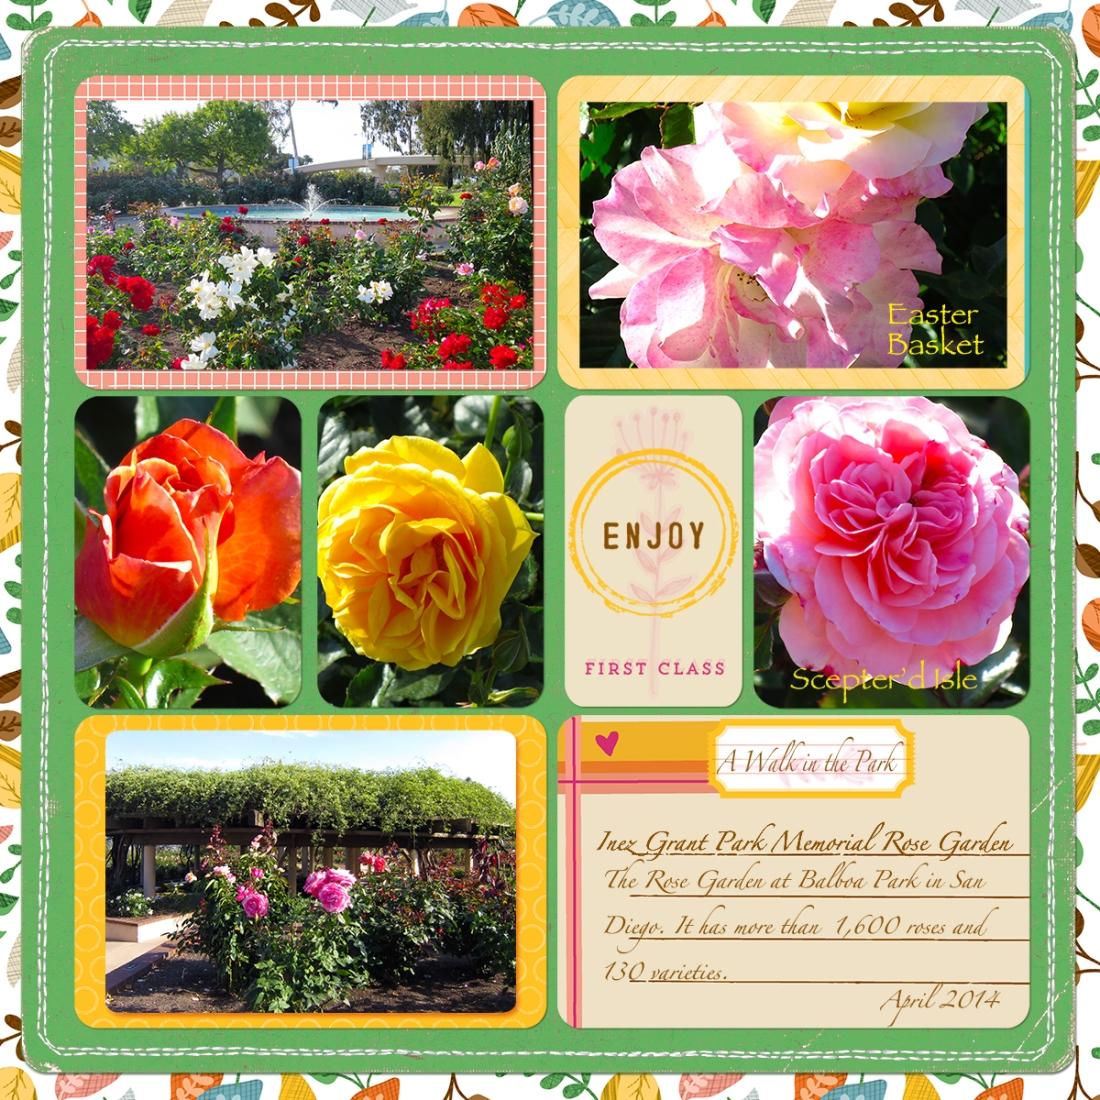 web rosegarden San Diego-ProjectLifeTemplate2013